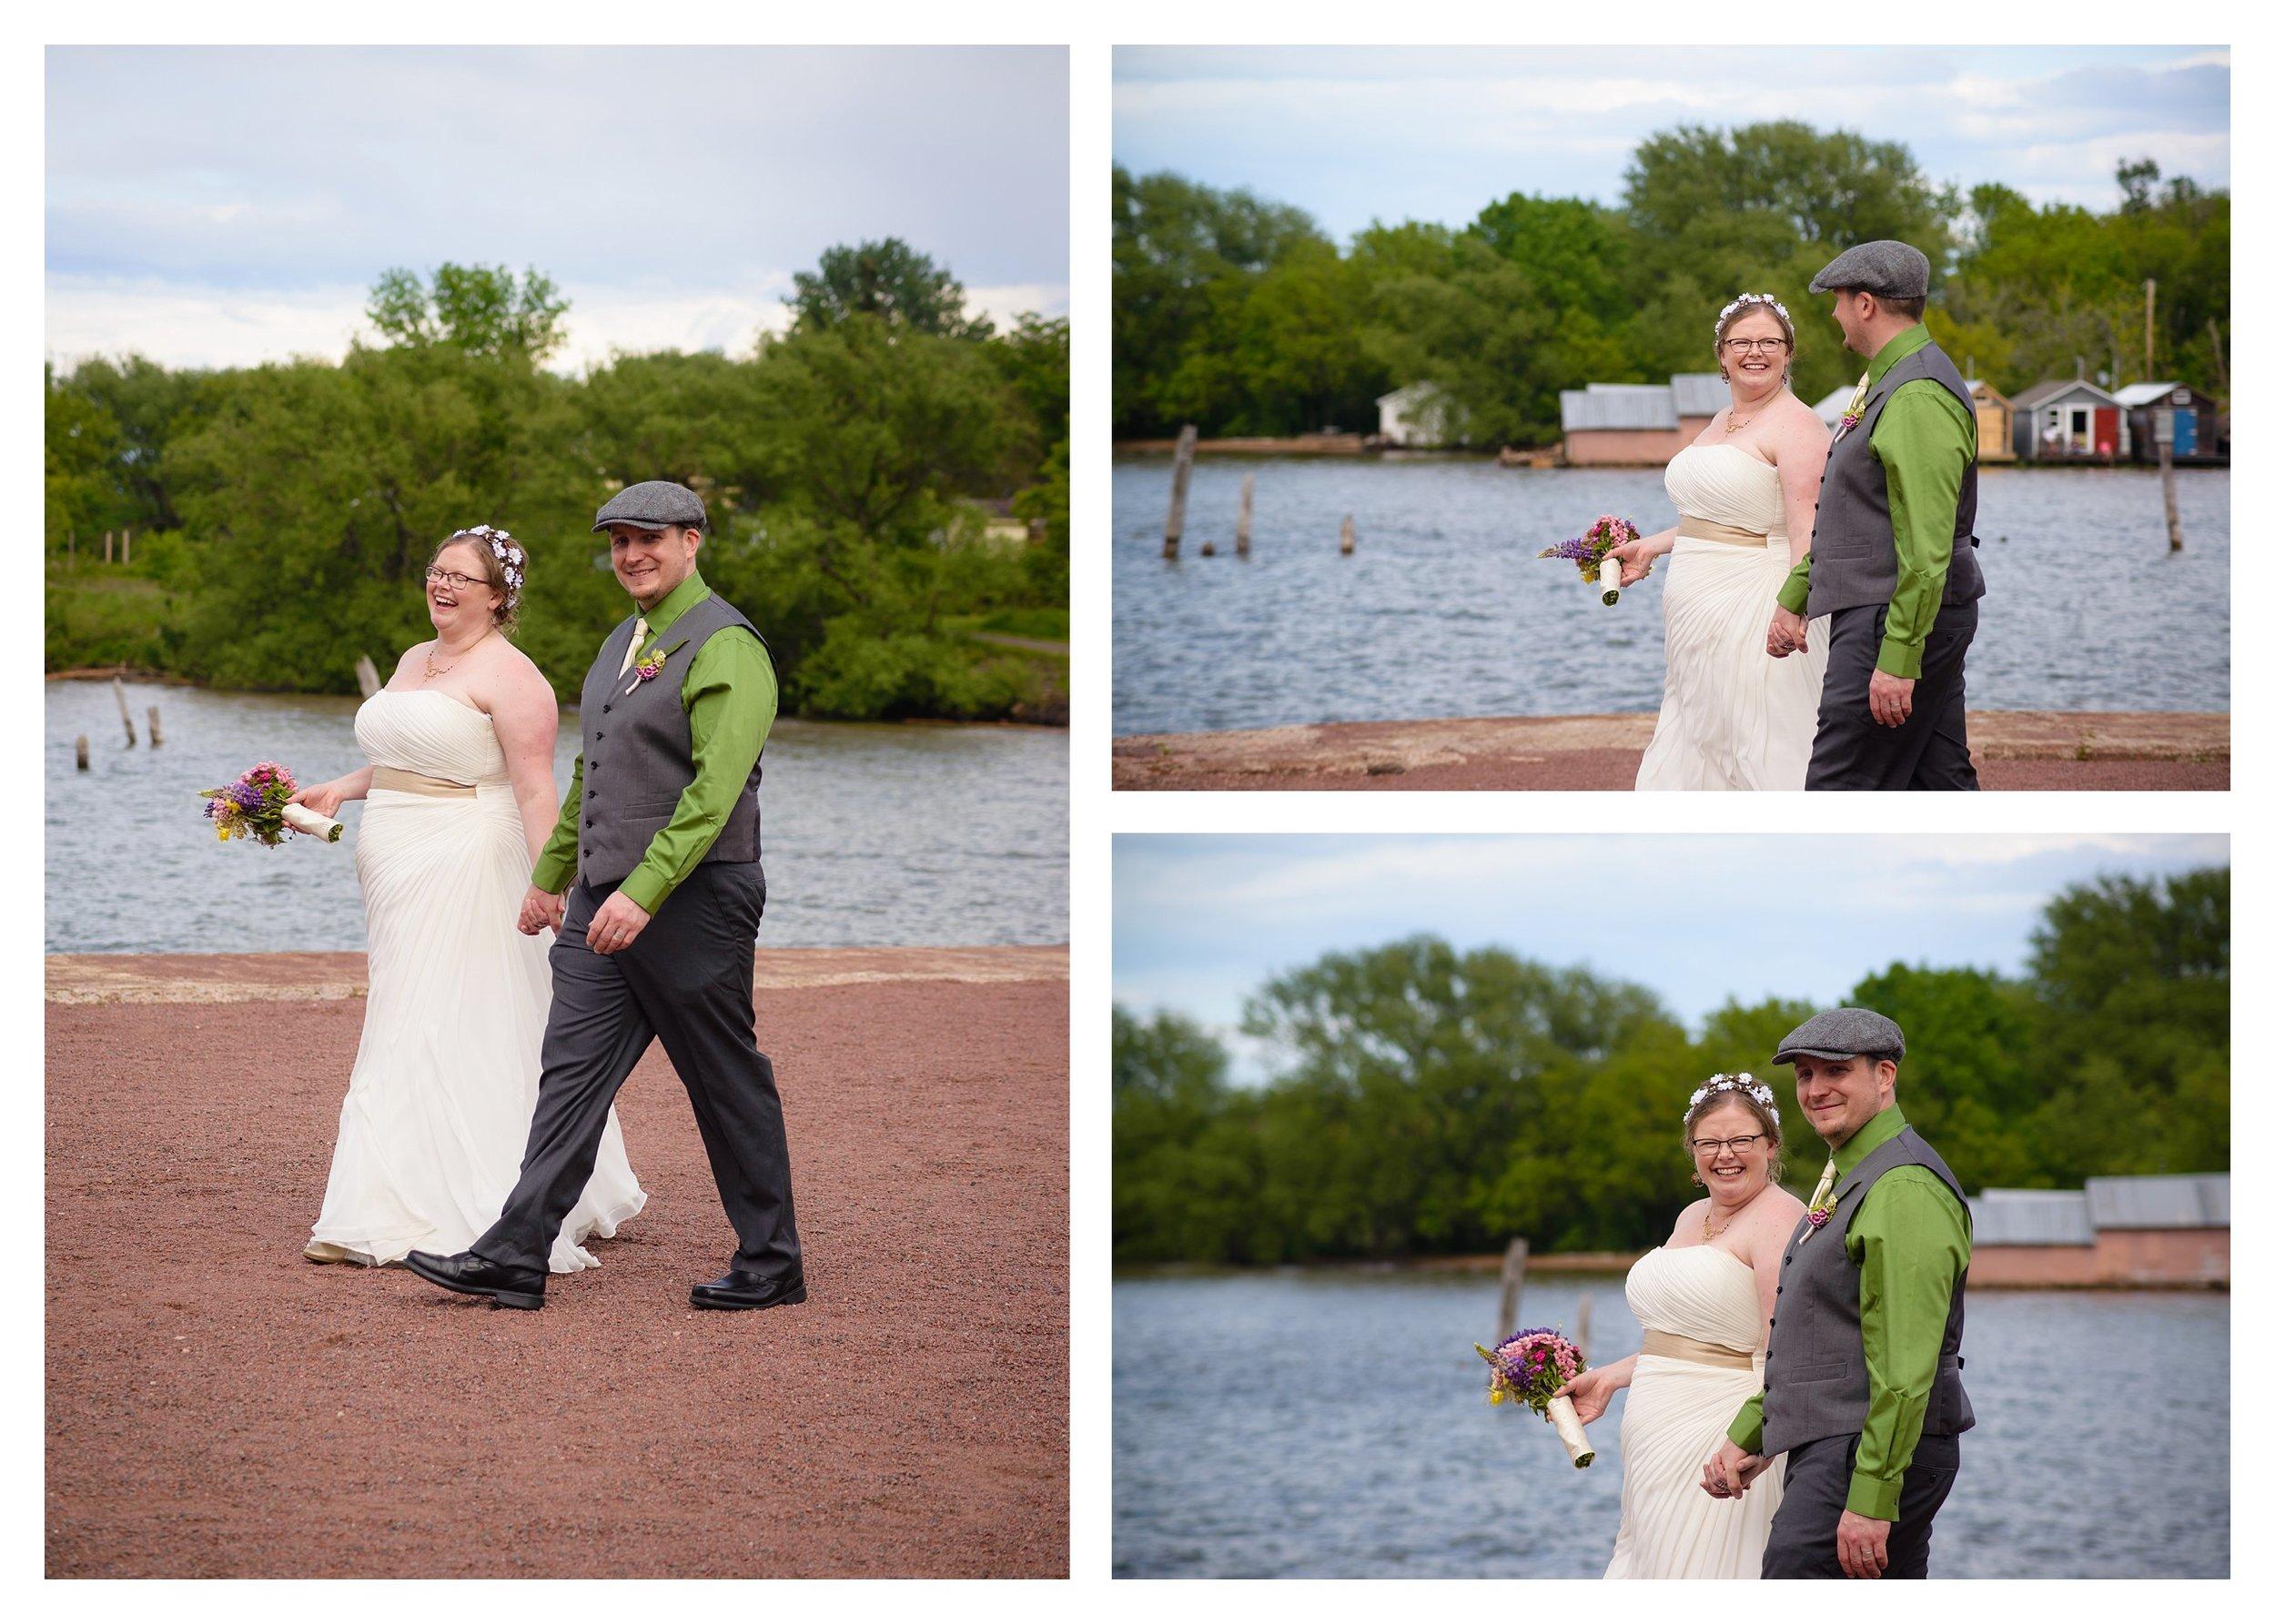 ashland oredock northwoods wisconsin wedding ps 139 photography_0298.jpg